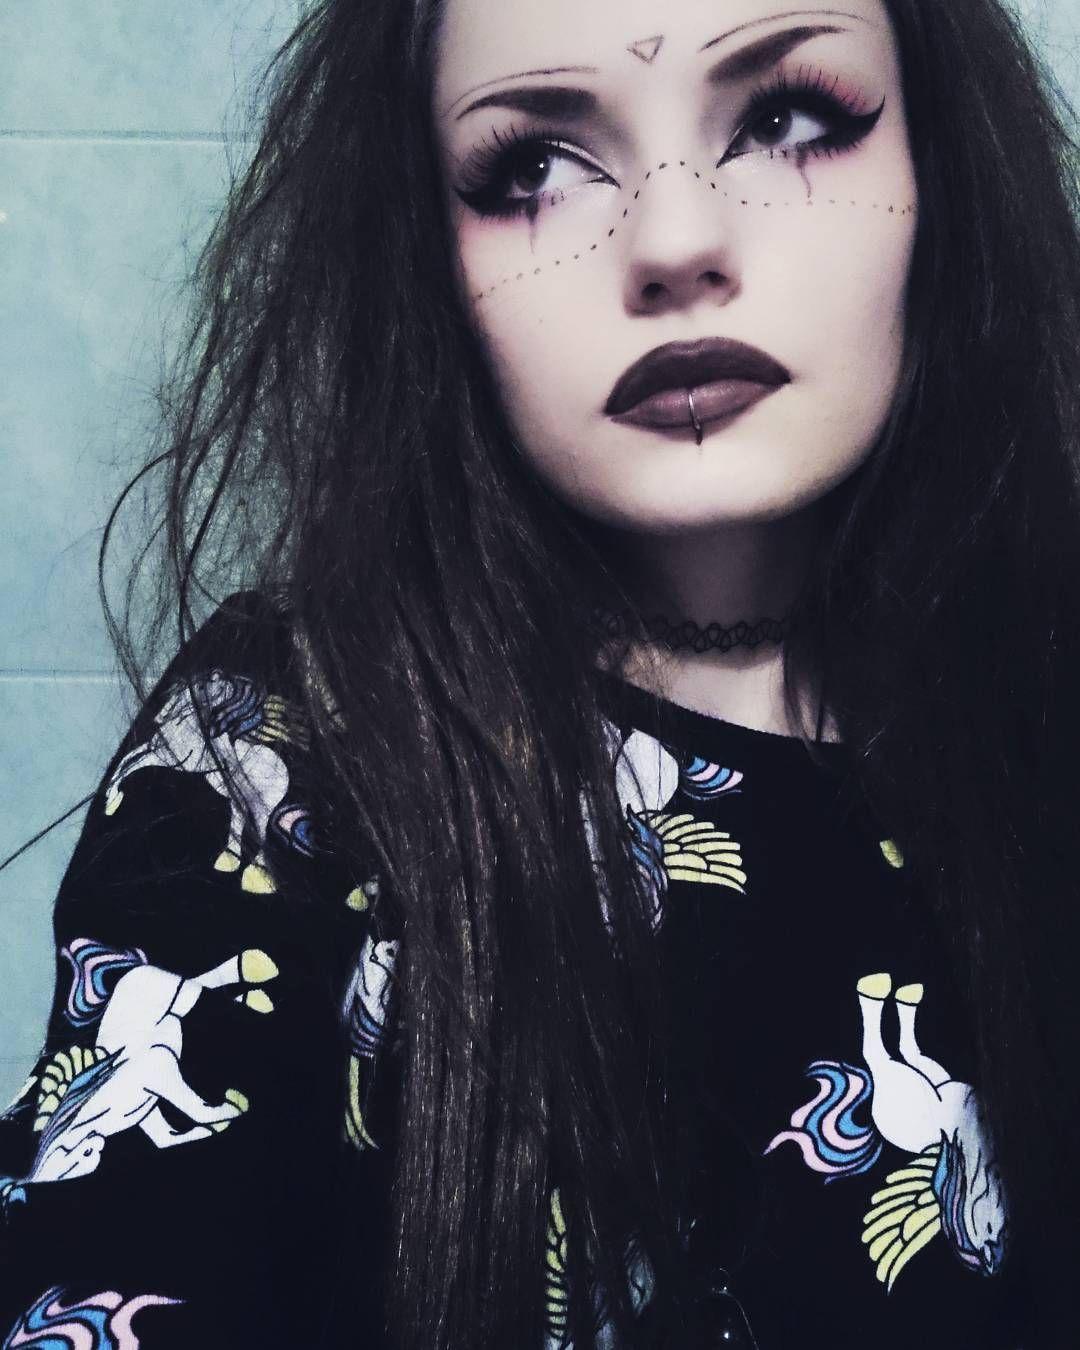 Instagram Photo By Little Witch Nov 13 2015 At 11 40pm Utc In 2020 Fasnacht Schminke Eyeliner Eyebrows